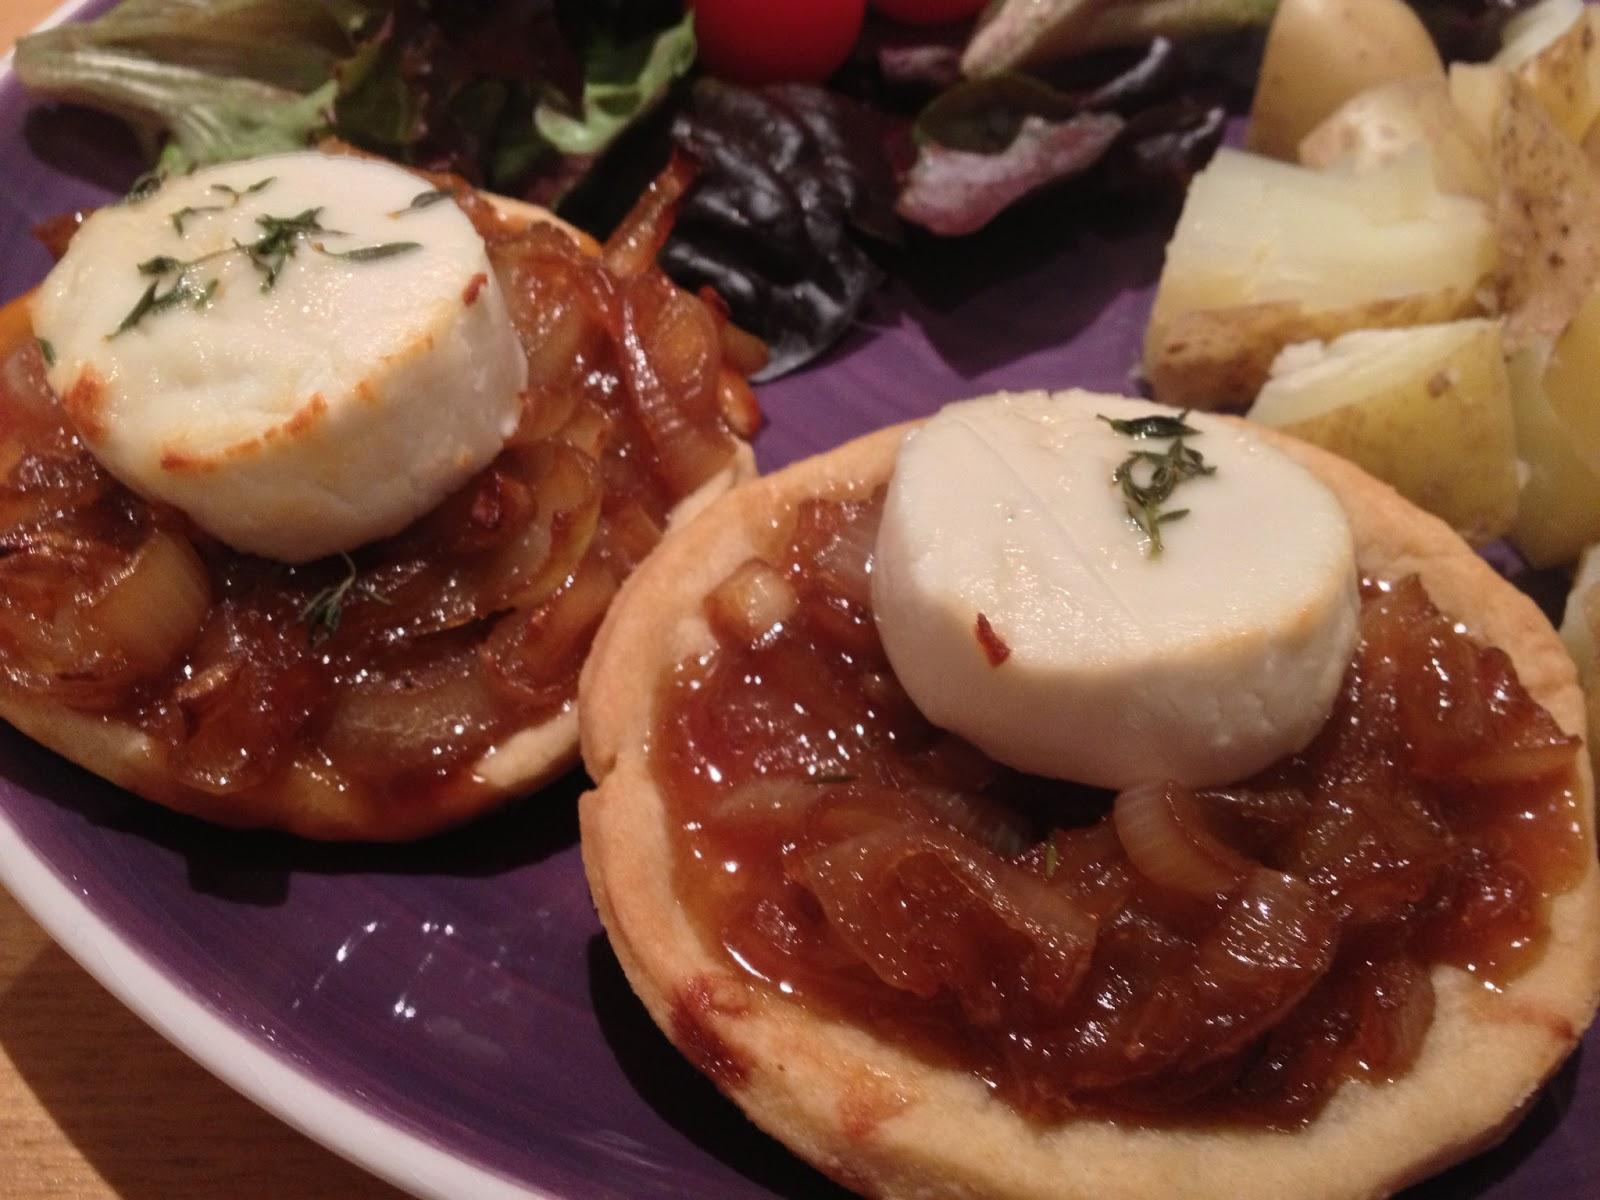 Jess S Messes Gorgeous Goats Cheese Tart Recipe